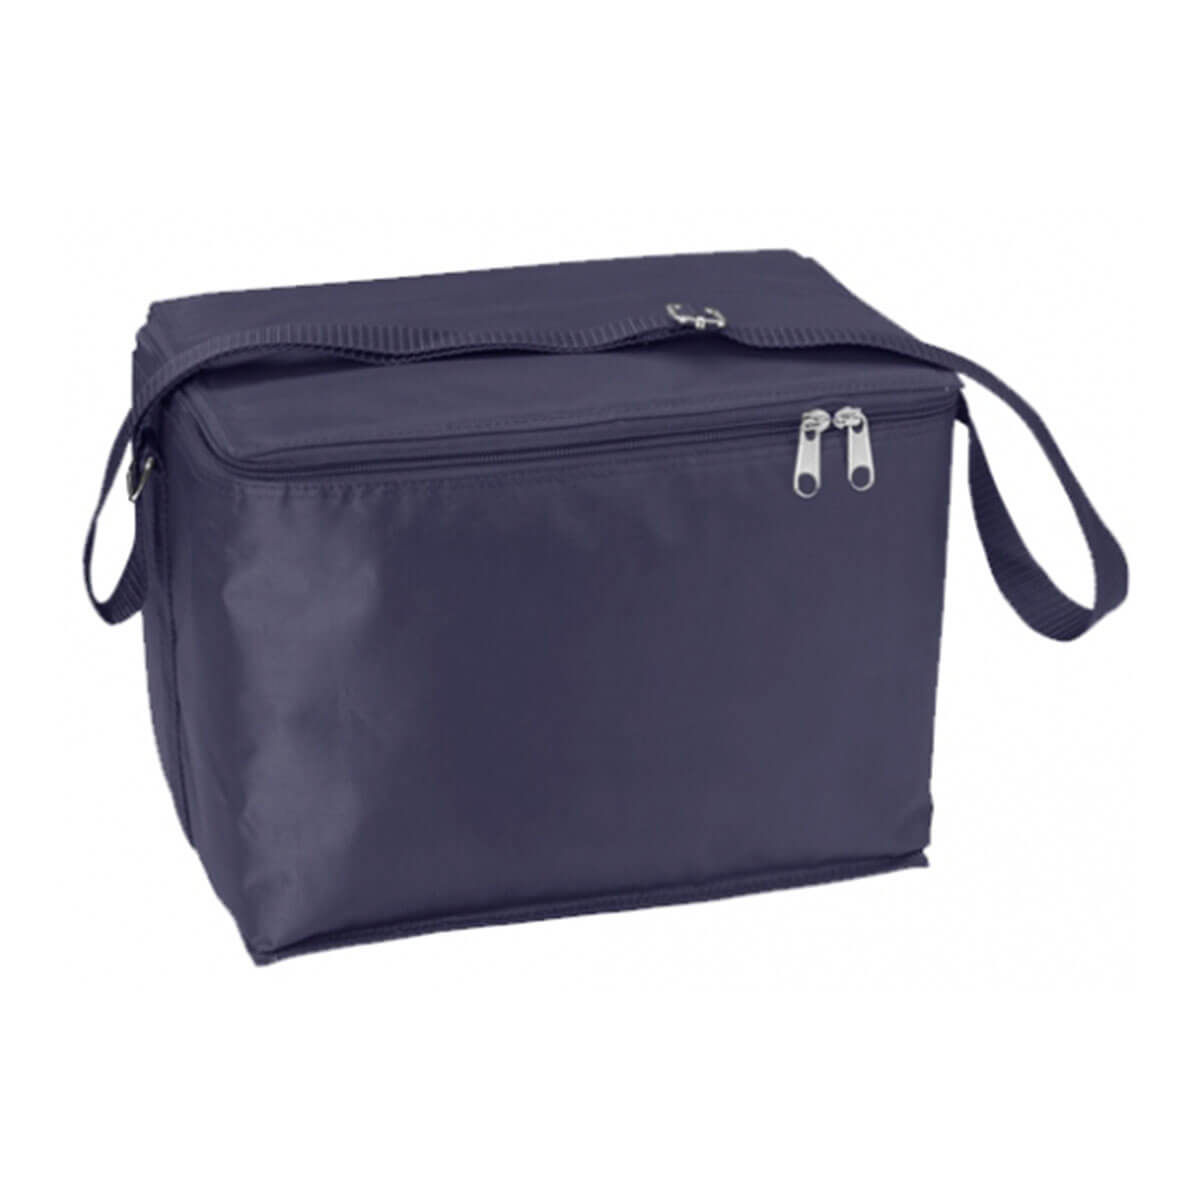 12 Can Cooler Bag-Navy